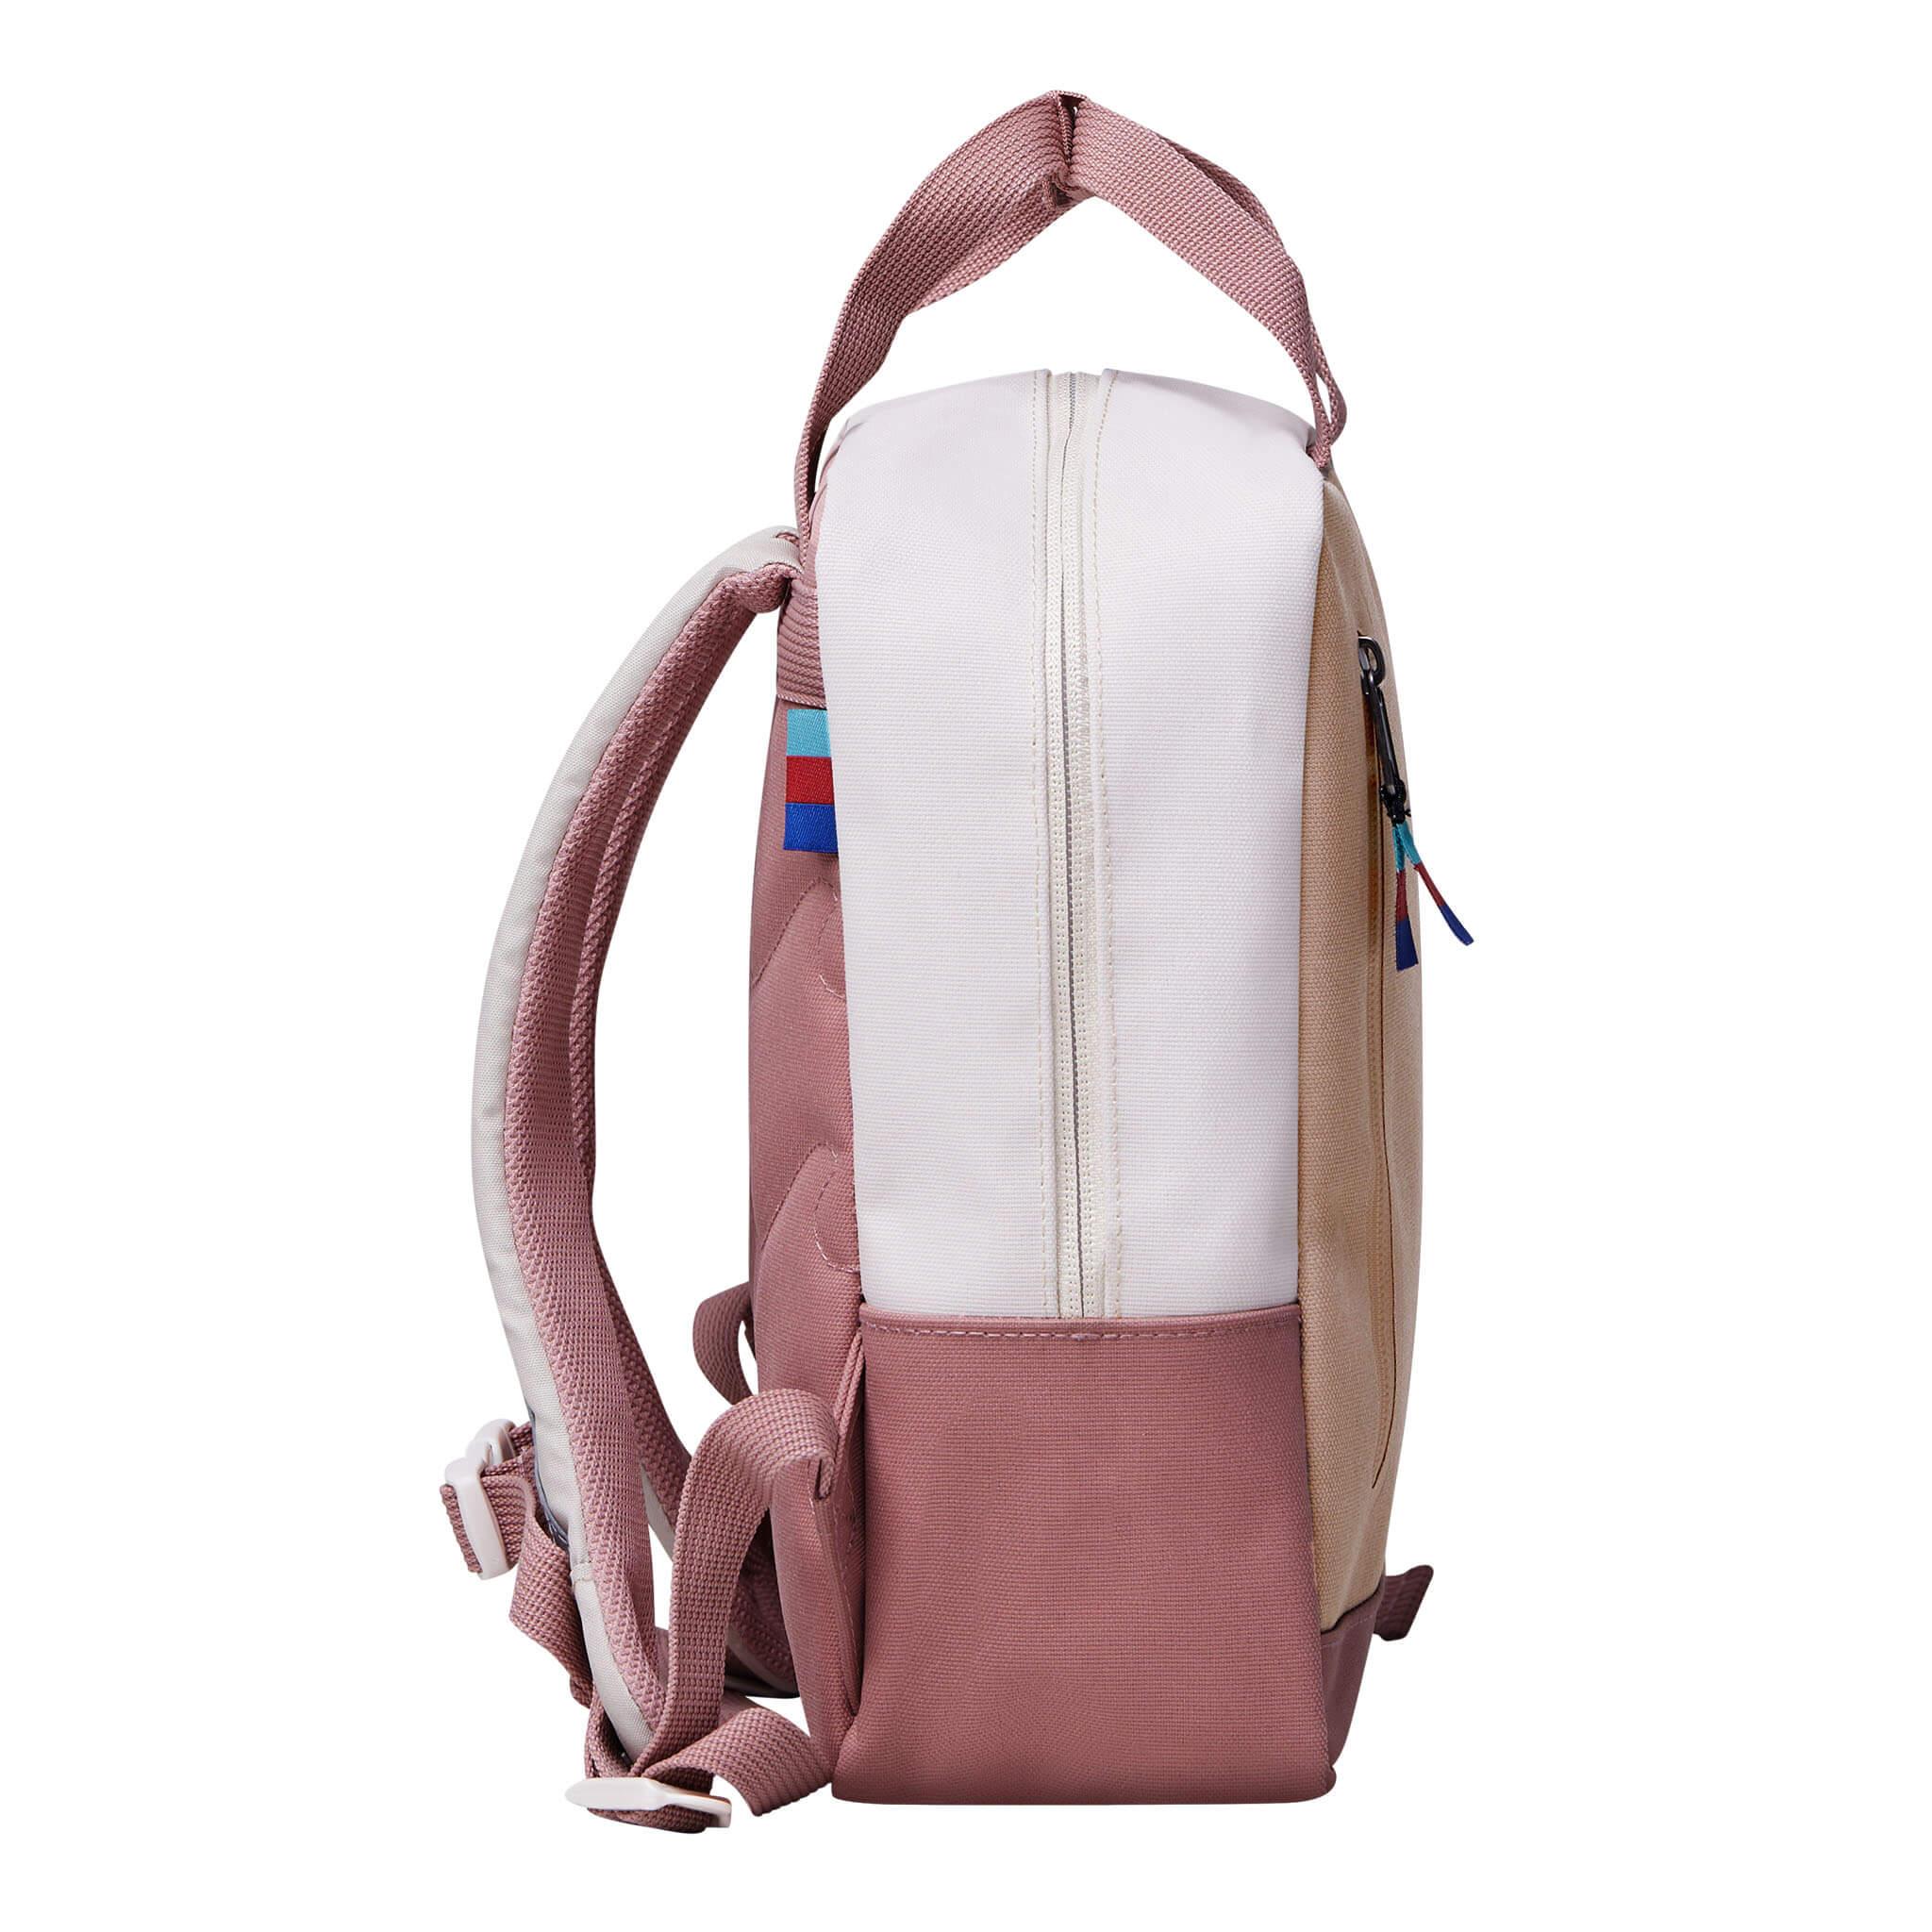 Got Bag Kids Collection- Daypack Mini - 5 Liter - Driftwood Multi